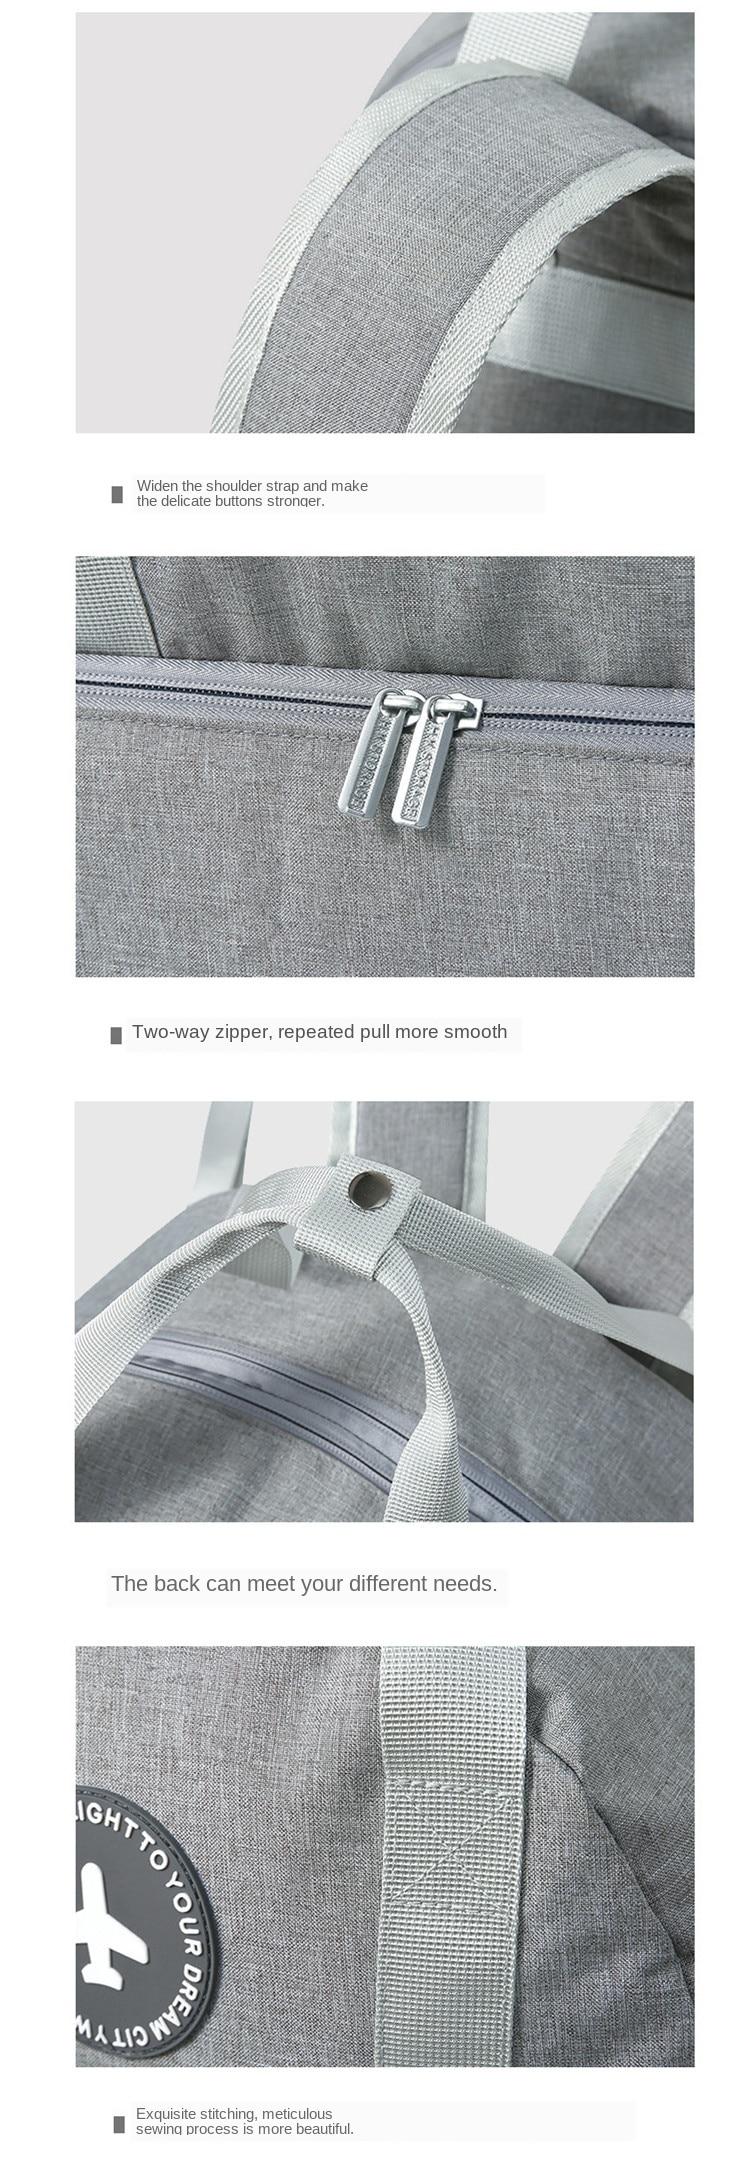 sapato independente acessórios do armazém